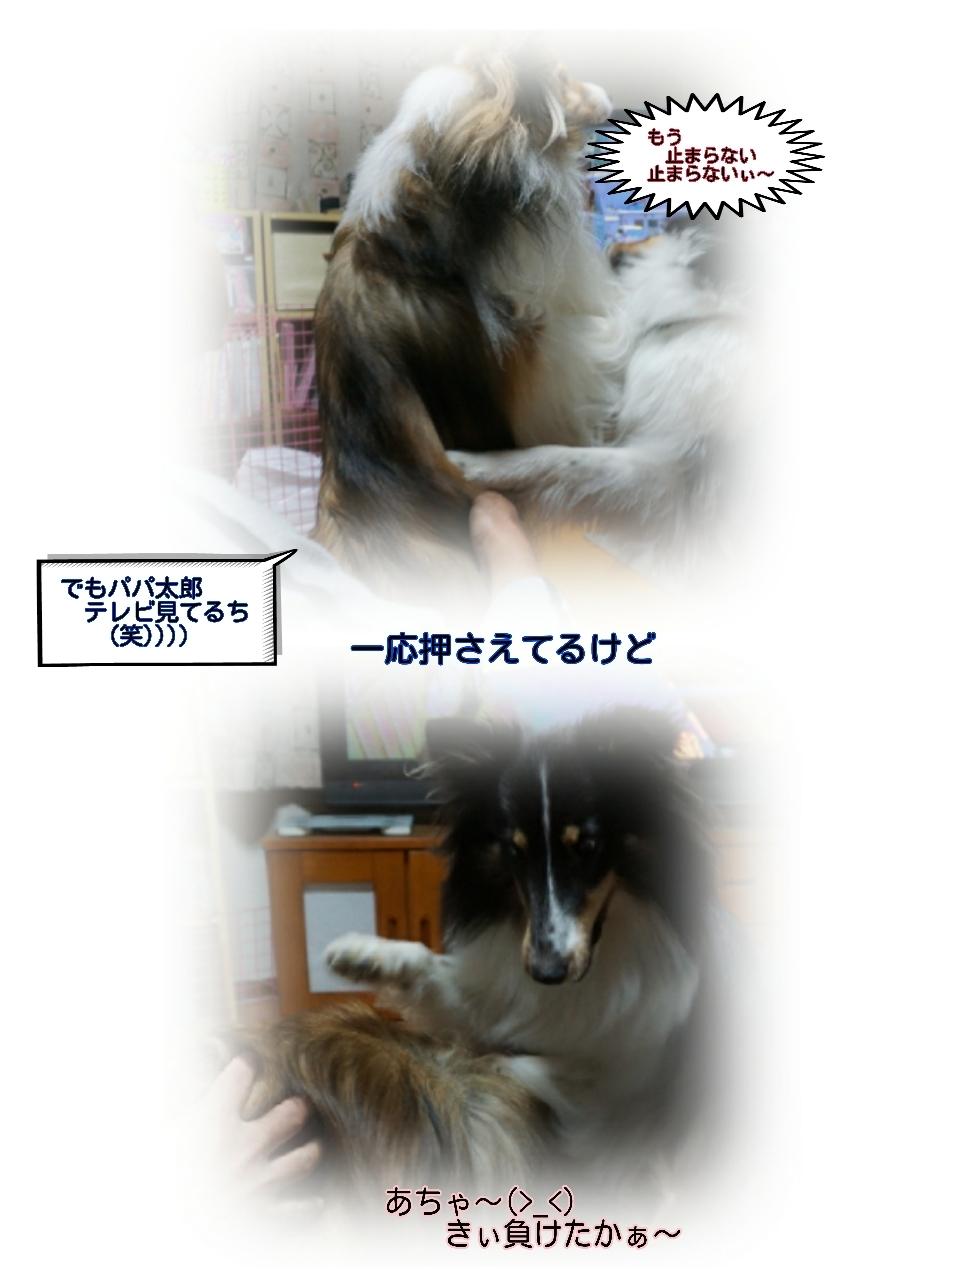 16-11-23-10-28-44-220_deco.jpg